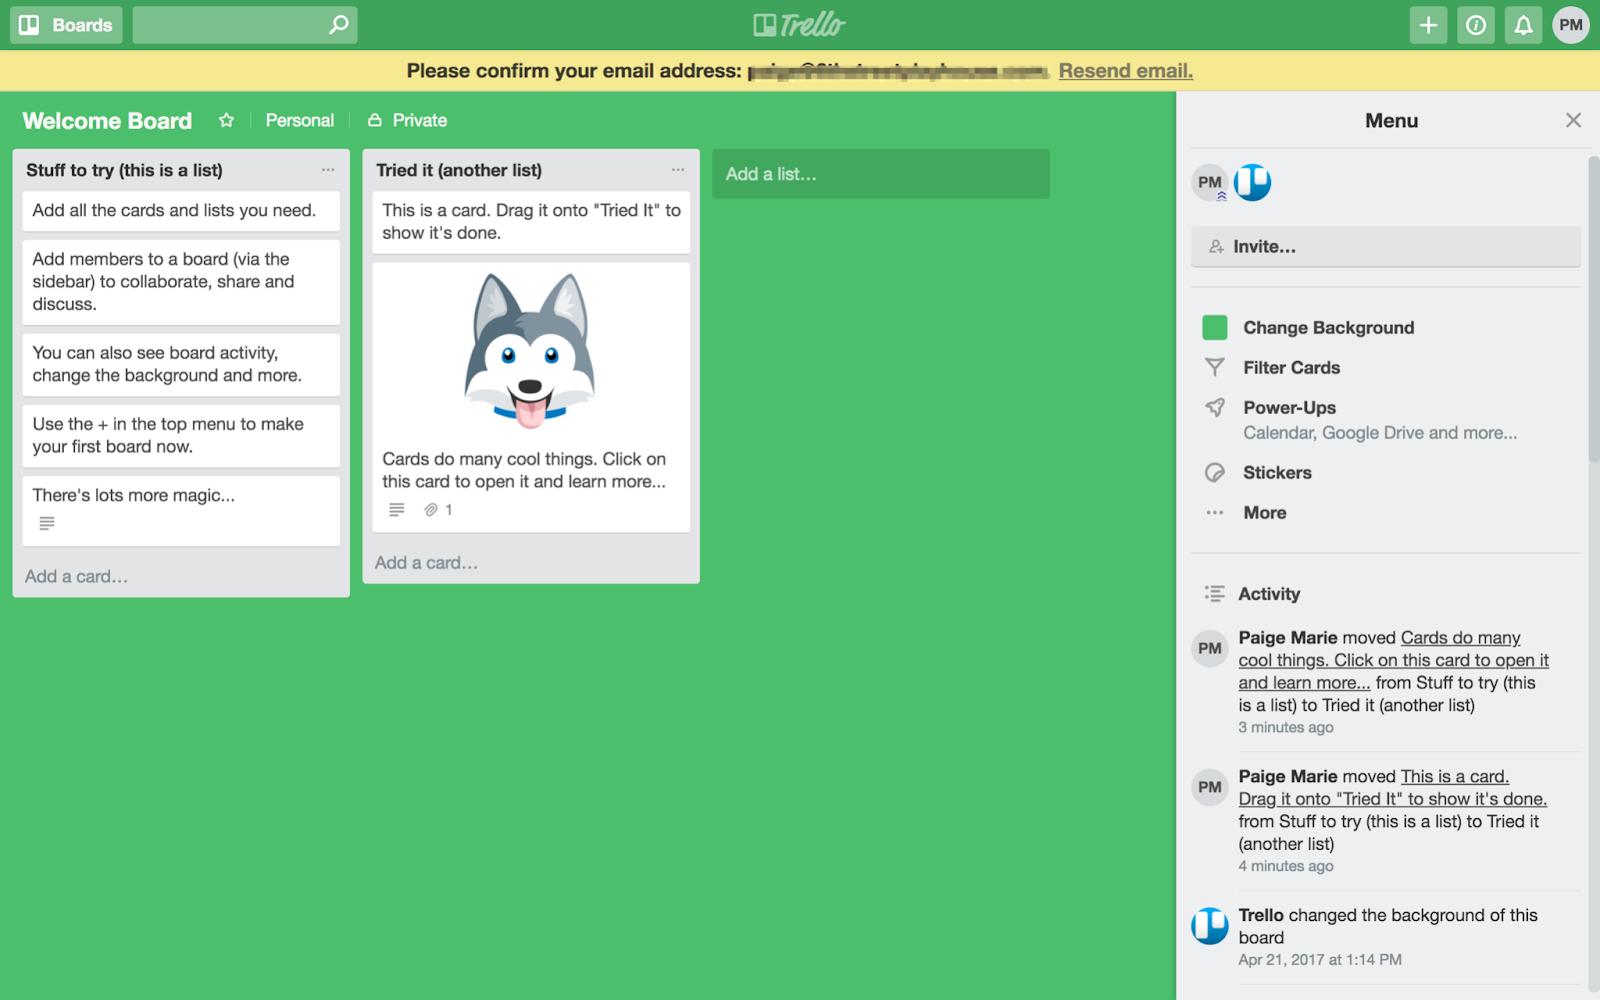 screenshot showing Trello's dashboard